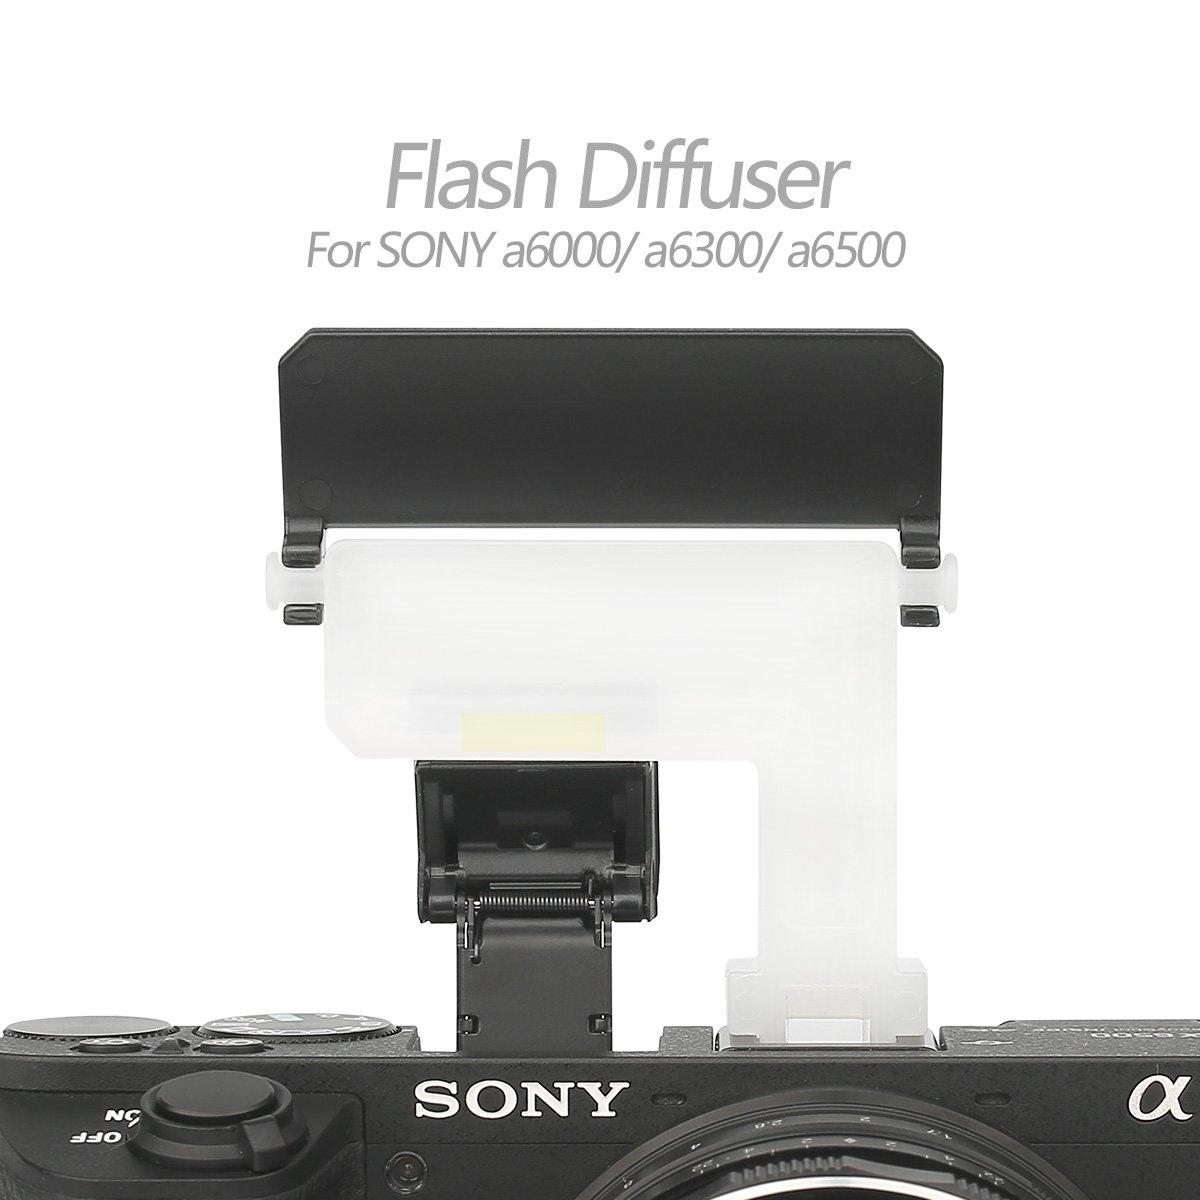 Mcoplus Df6500mehrfarbig 4in 1flash Diffusor Mini Flash Bounce Tragbar We Elektromaterial Akkus & Batterien